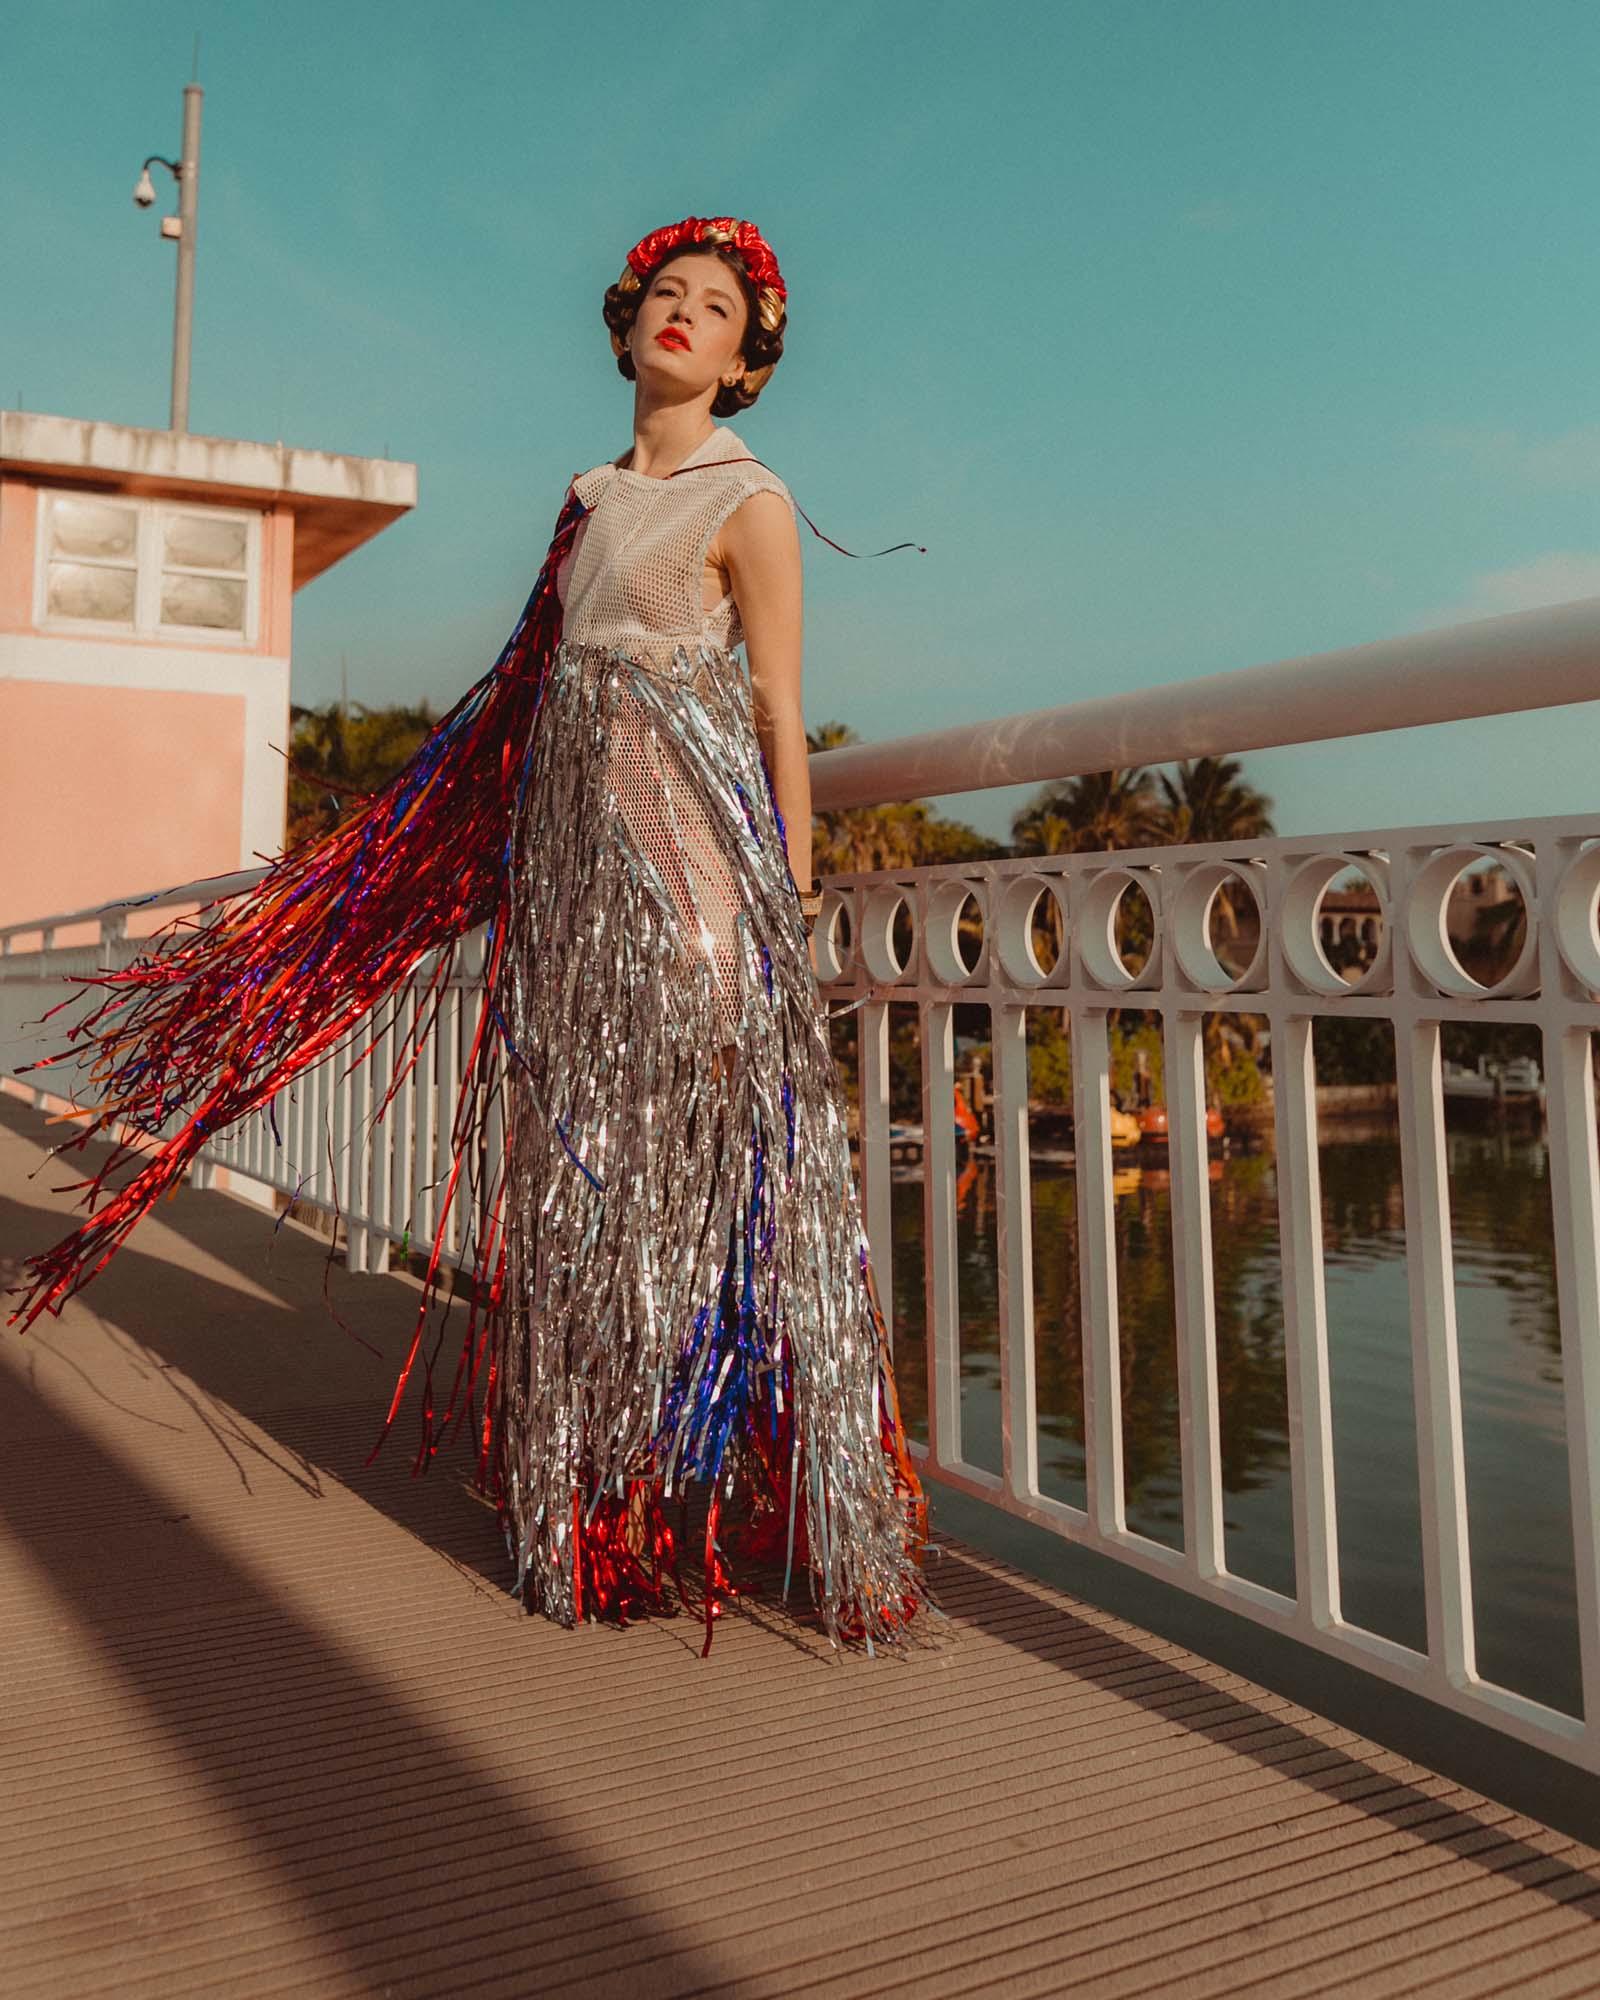 Danie-Miami-Beach-Celia-D-Luna-0001